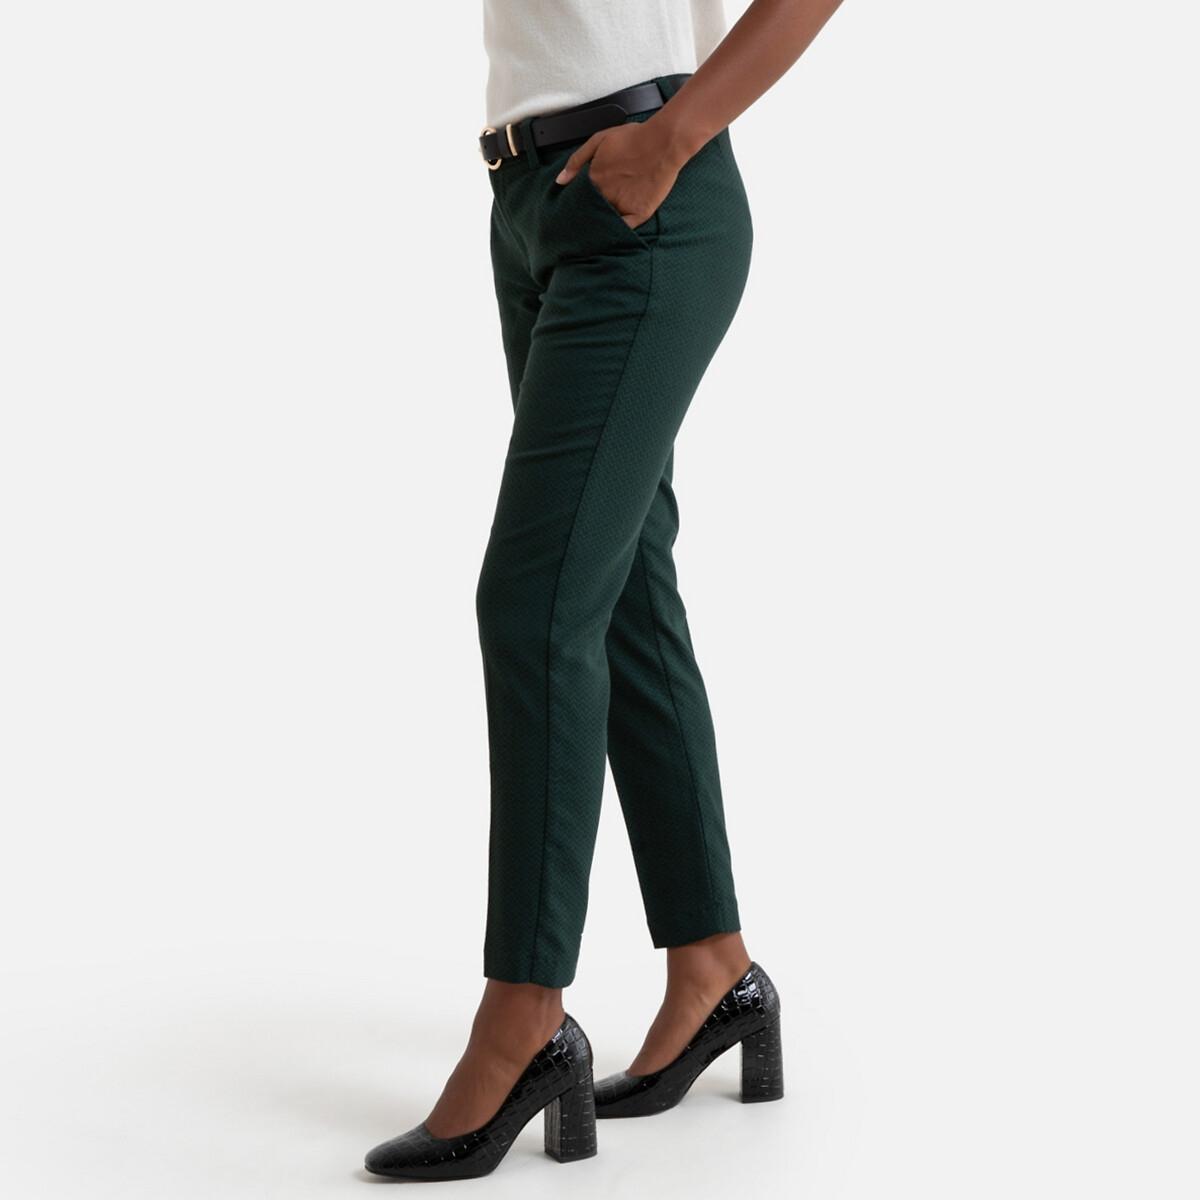 Брюки-дудочки LaRedoute La Redoute 42 (FR) - 48 (RUS) зеленый брюки скинни la redoute эффект карго длина 30 38 fr 44 rus зеленый